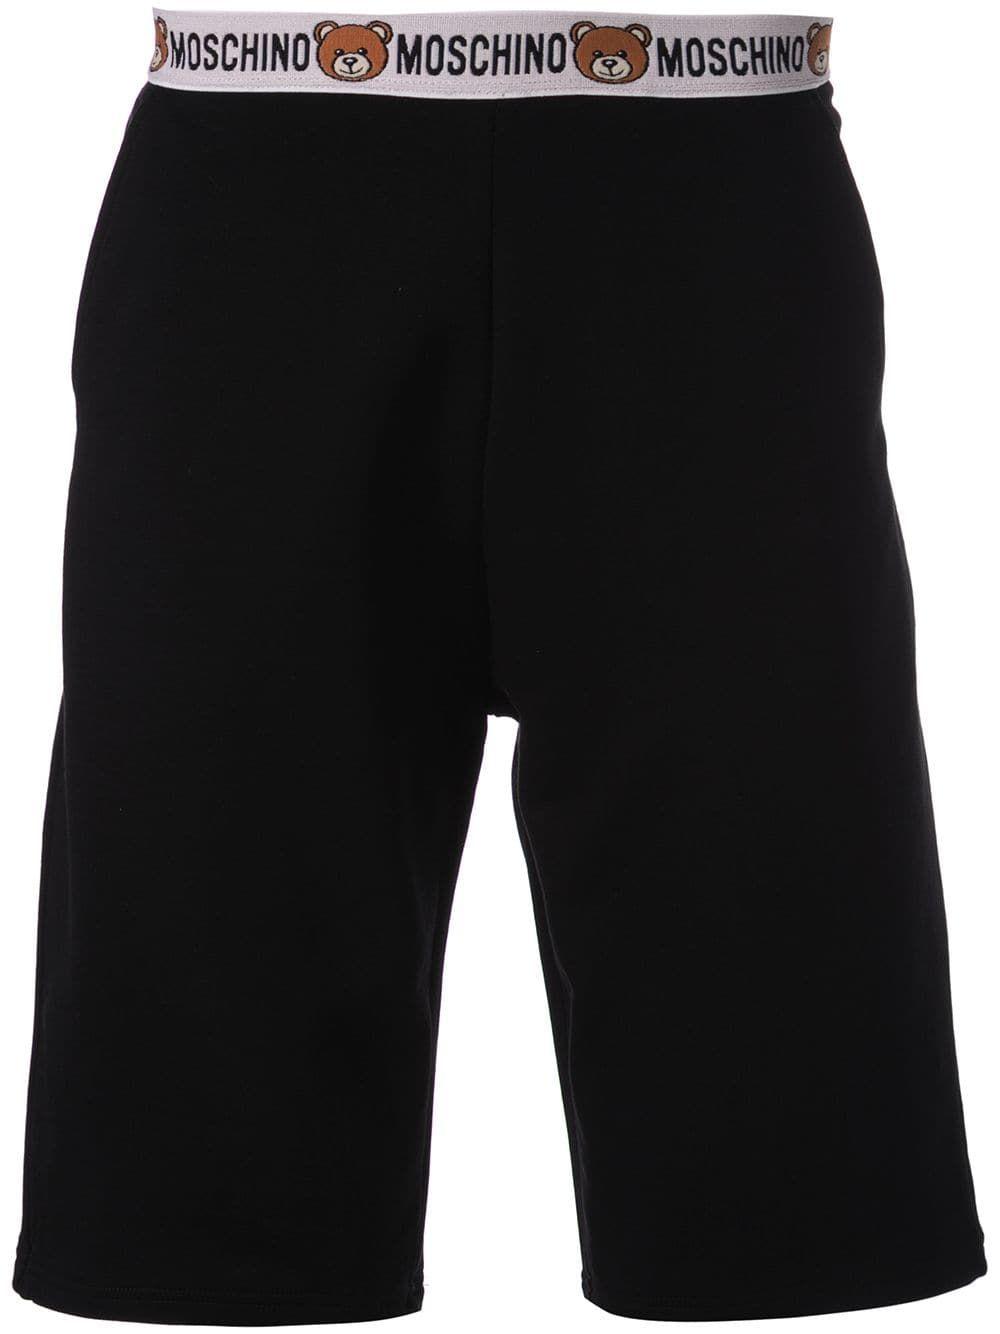 6c0a0dba20 MOSCHINO MOSCHINO TEDDY BEAR TRIMMED SHORTS - BLACK. #moschino #cloth